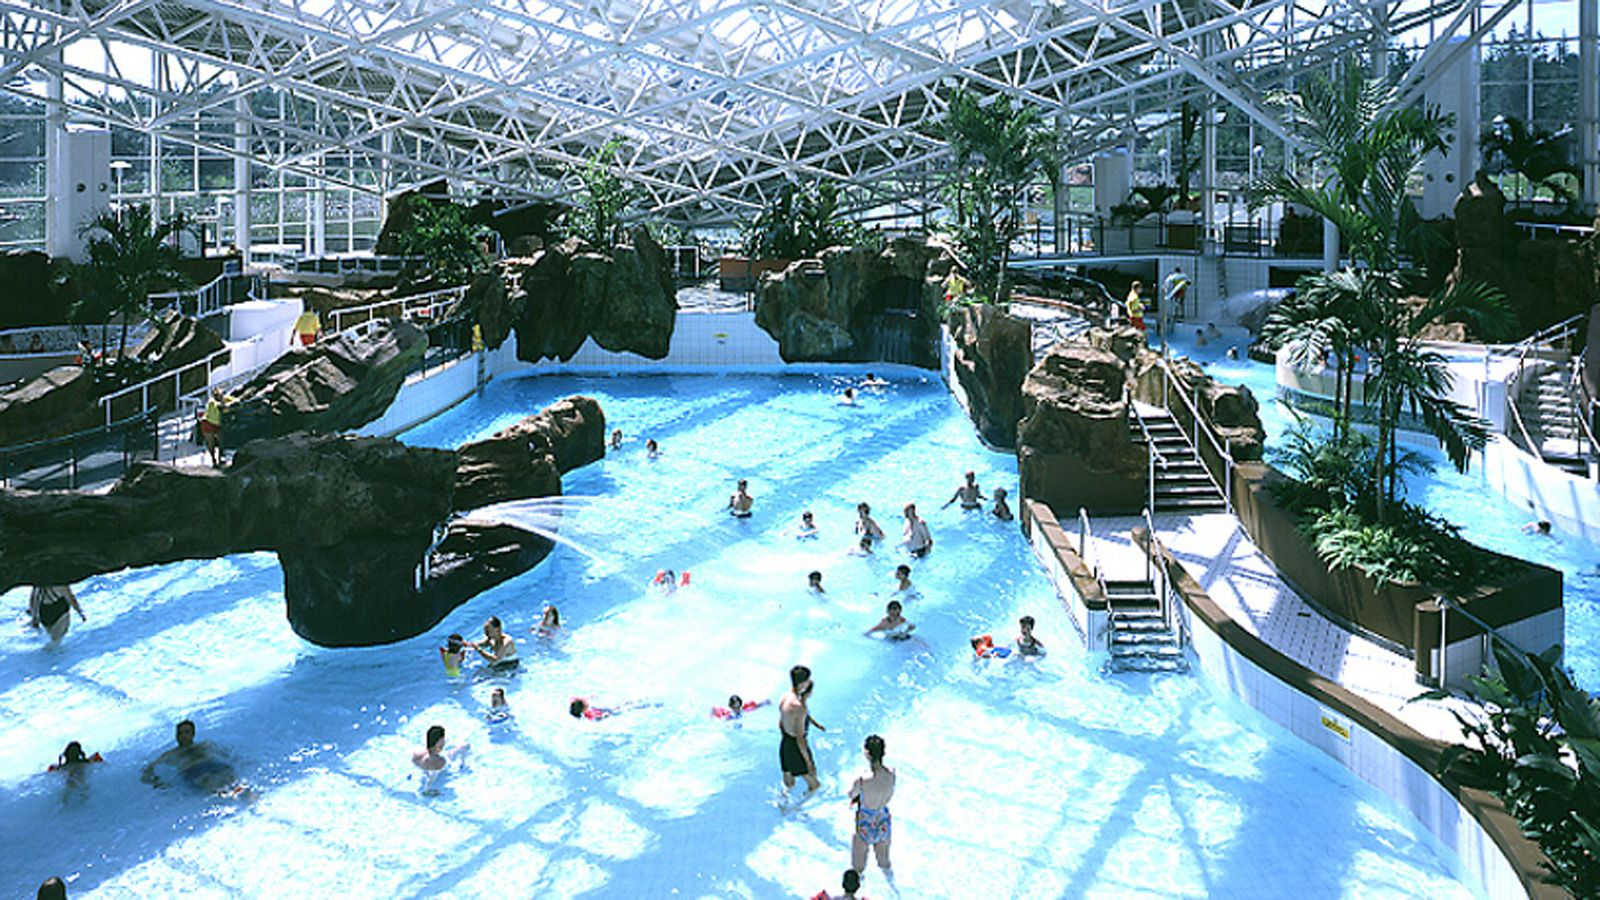 Holder mathias architects i leisure i center parcs - Lake district campsites with swimming pool ...